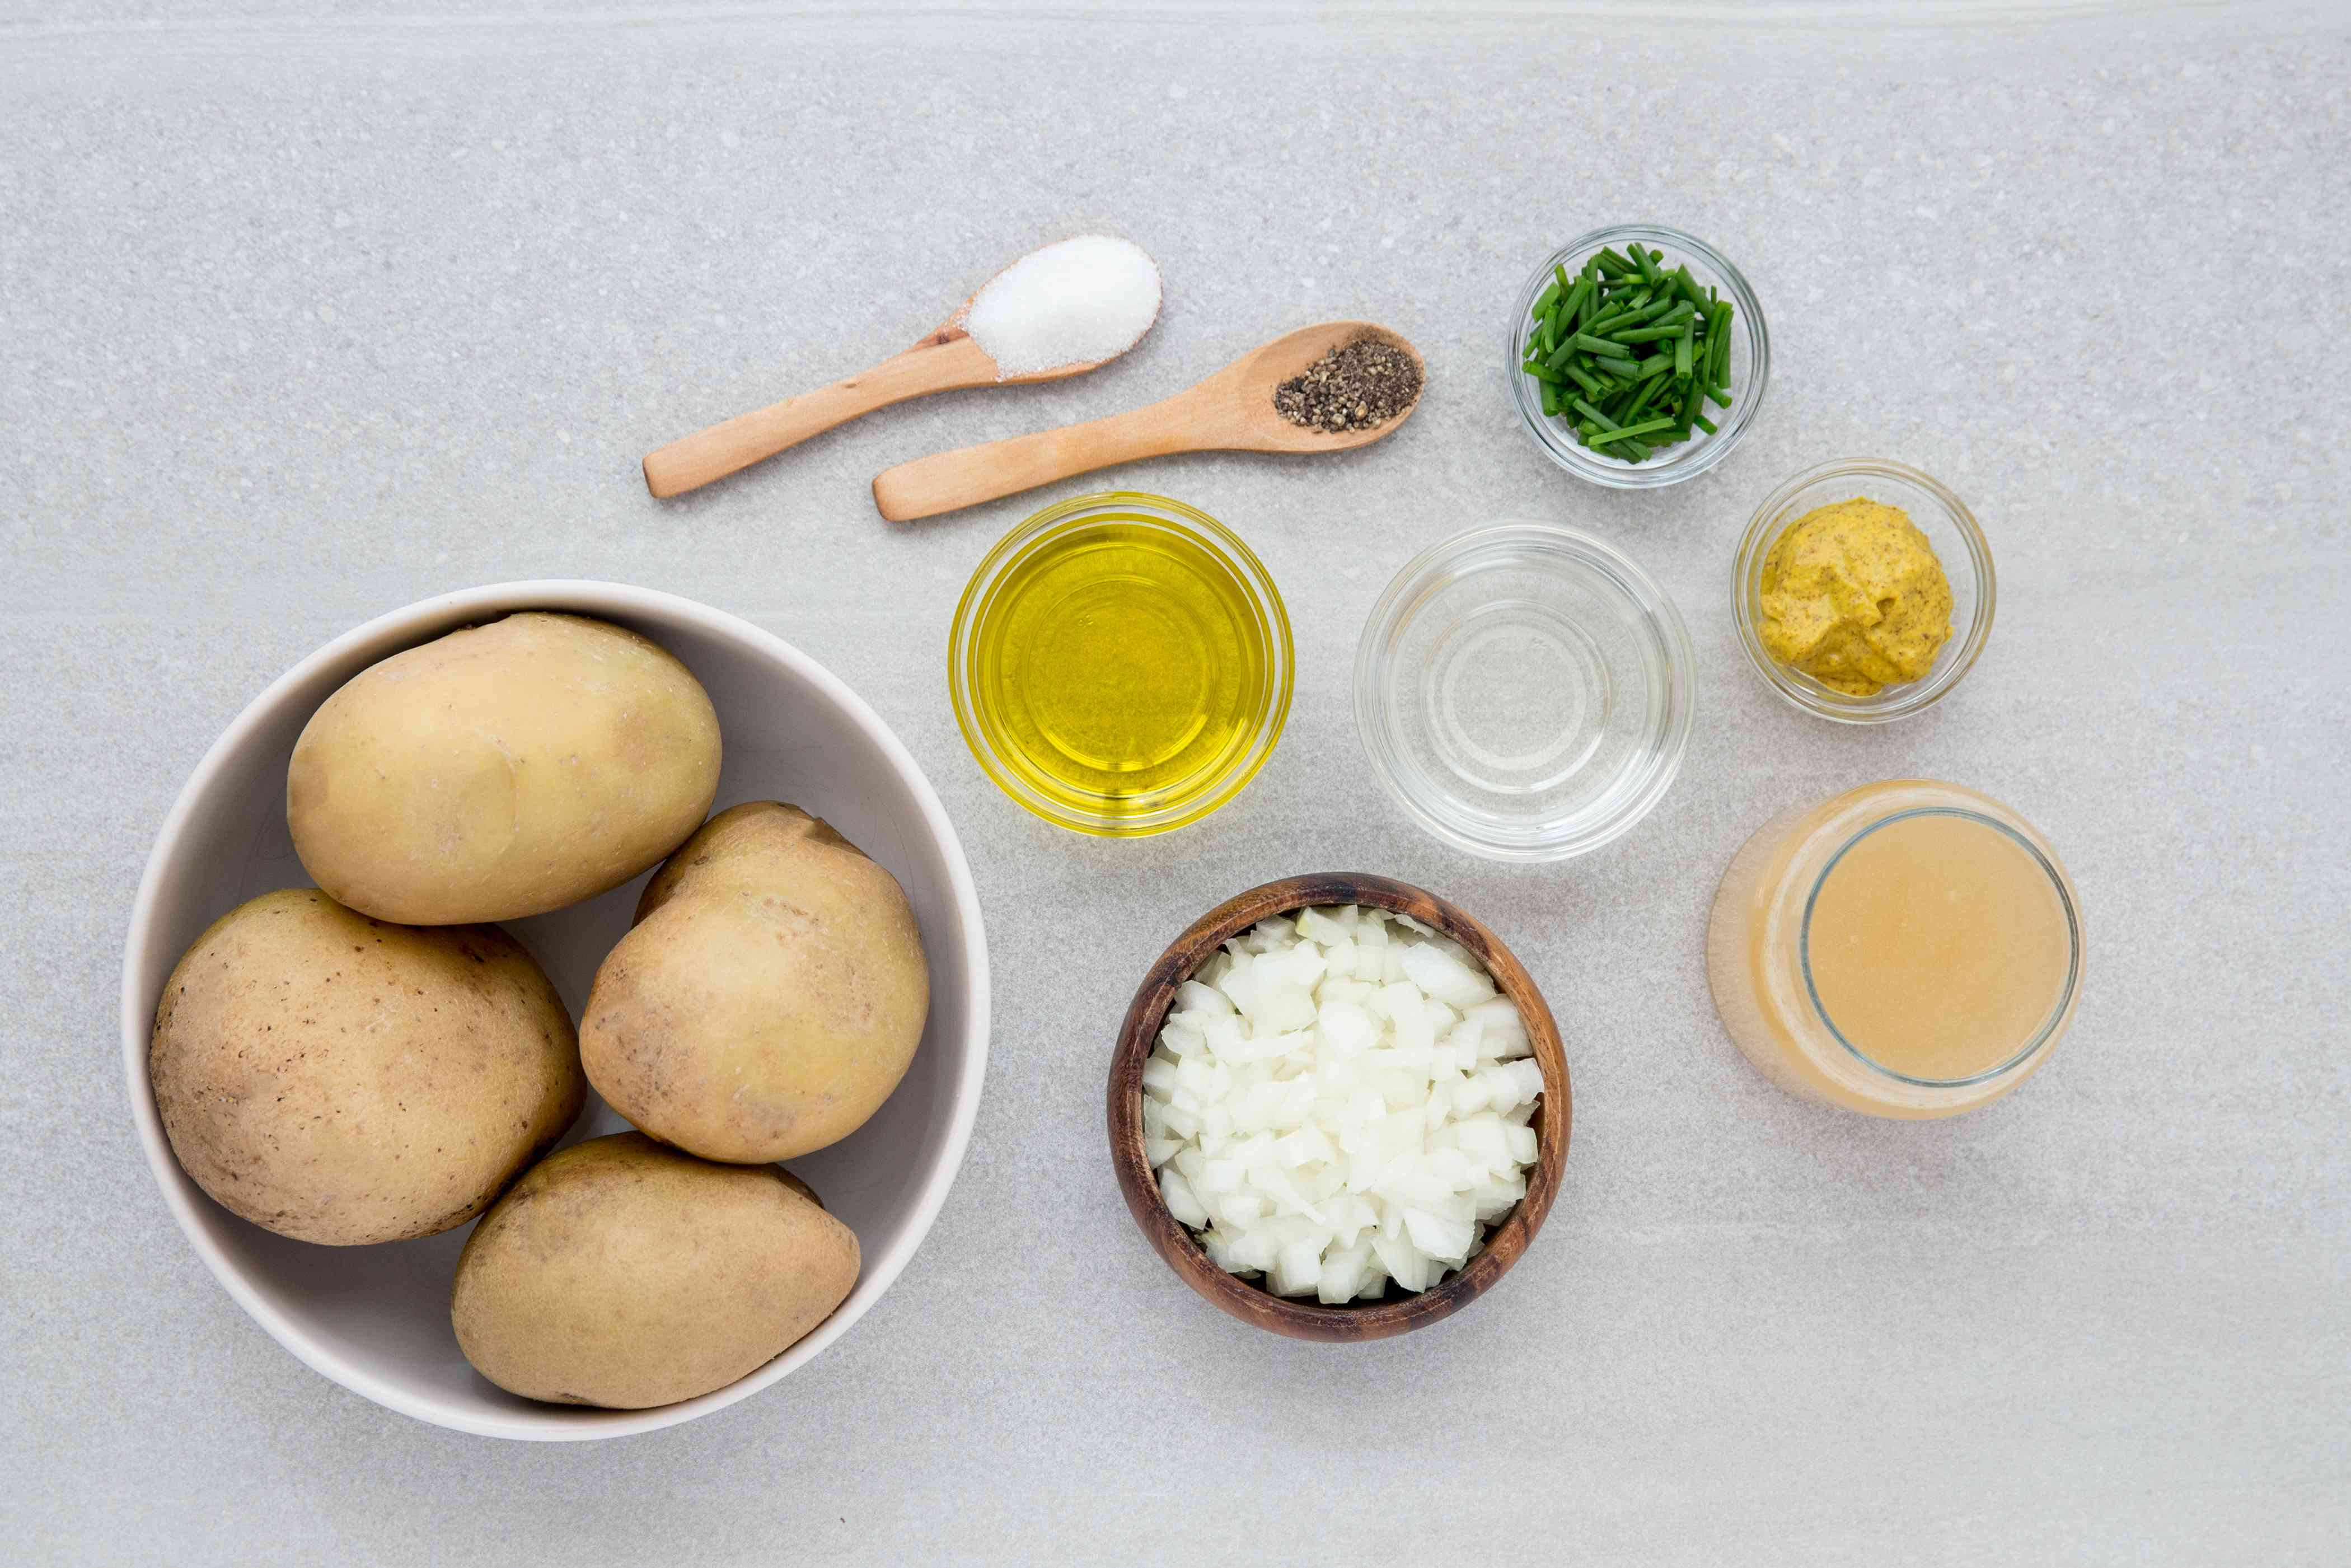 Gather the ingredients German Salad